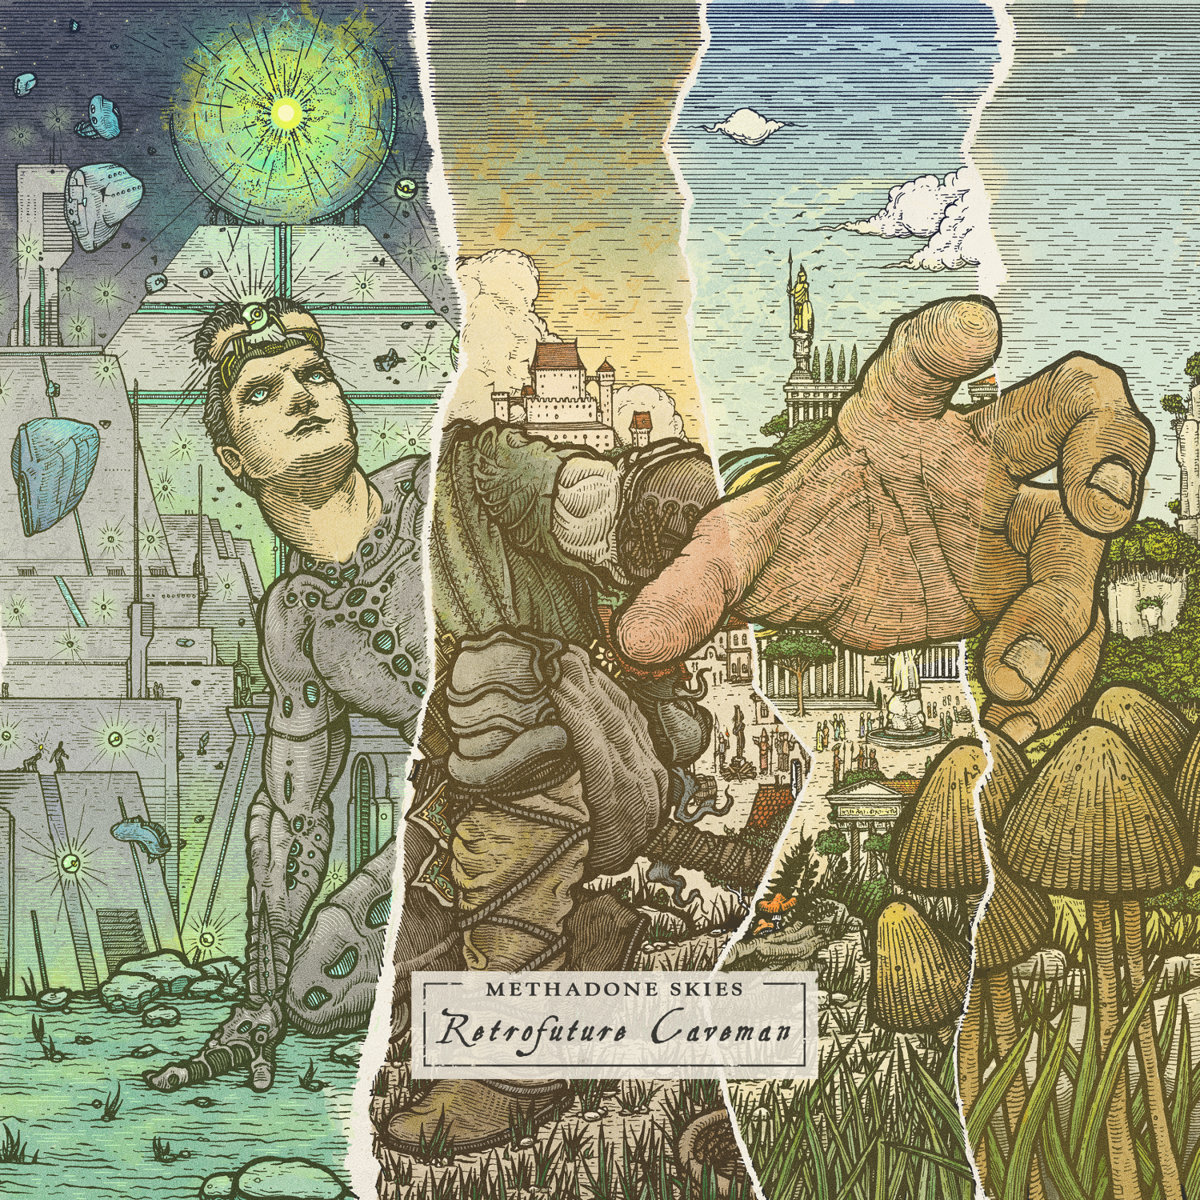 Methadone Skies: Retrofuture Caveman